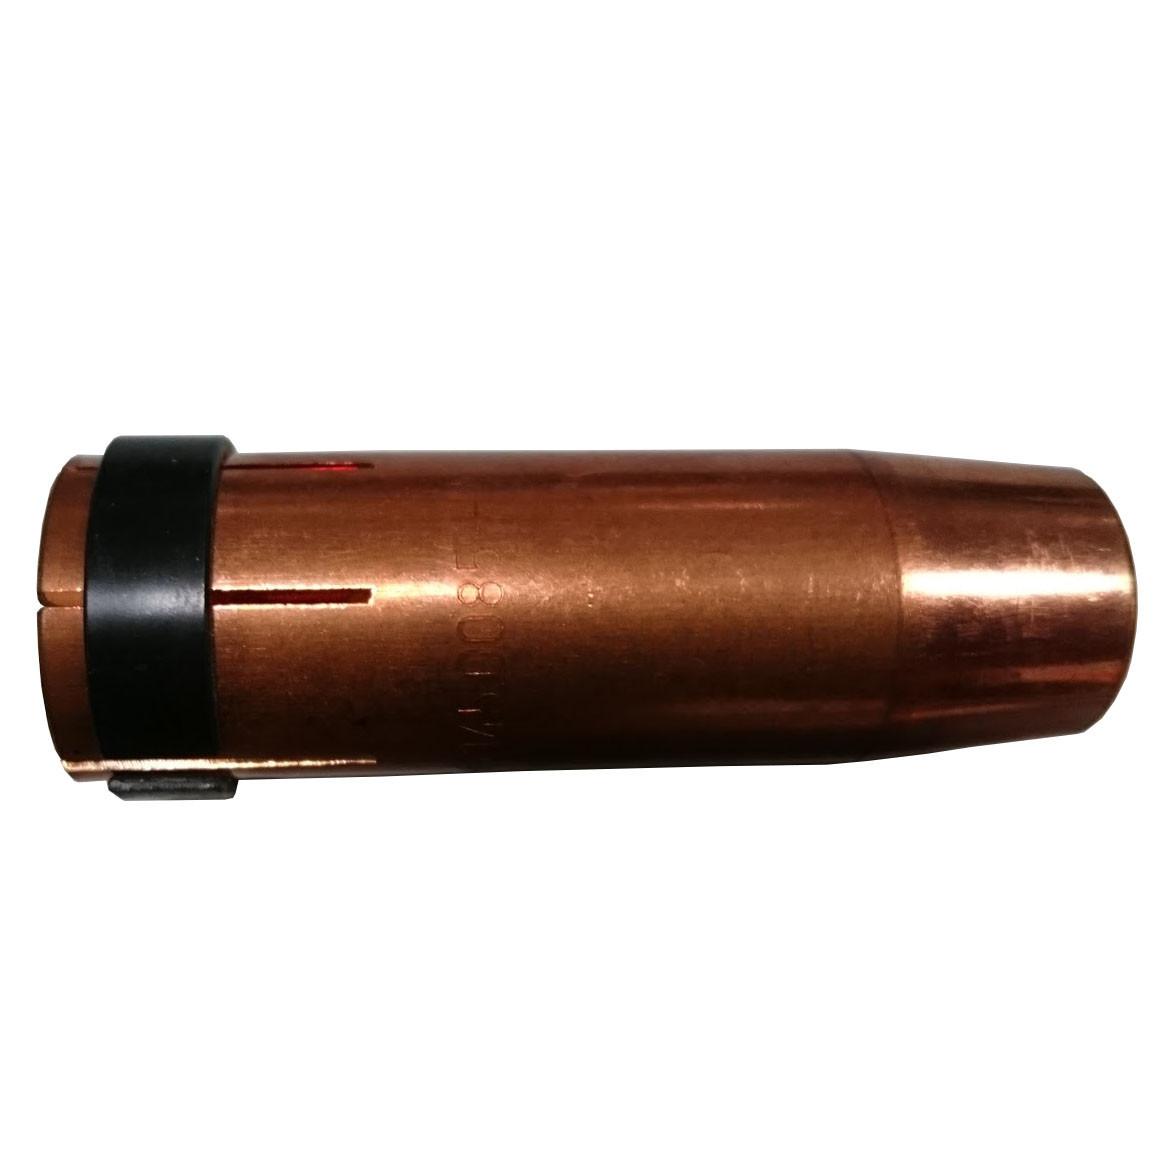 Газове сопло конічне D16,0/76,0 мм MB 401 / 501 / D GRIP